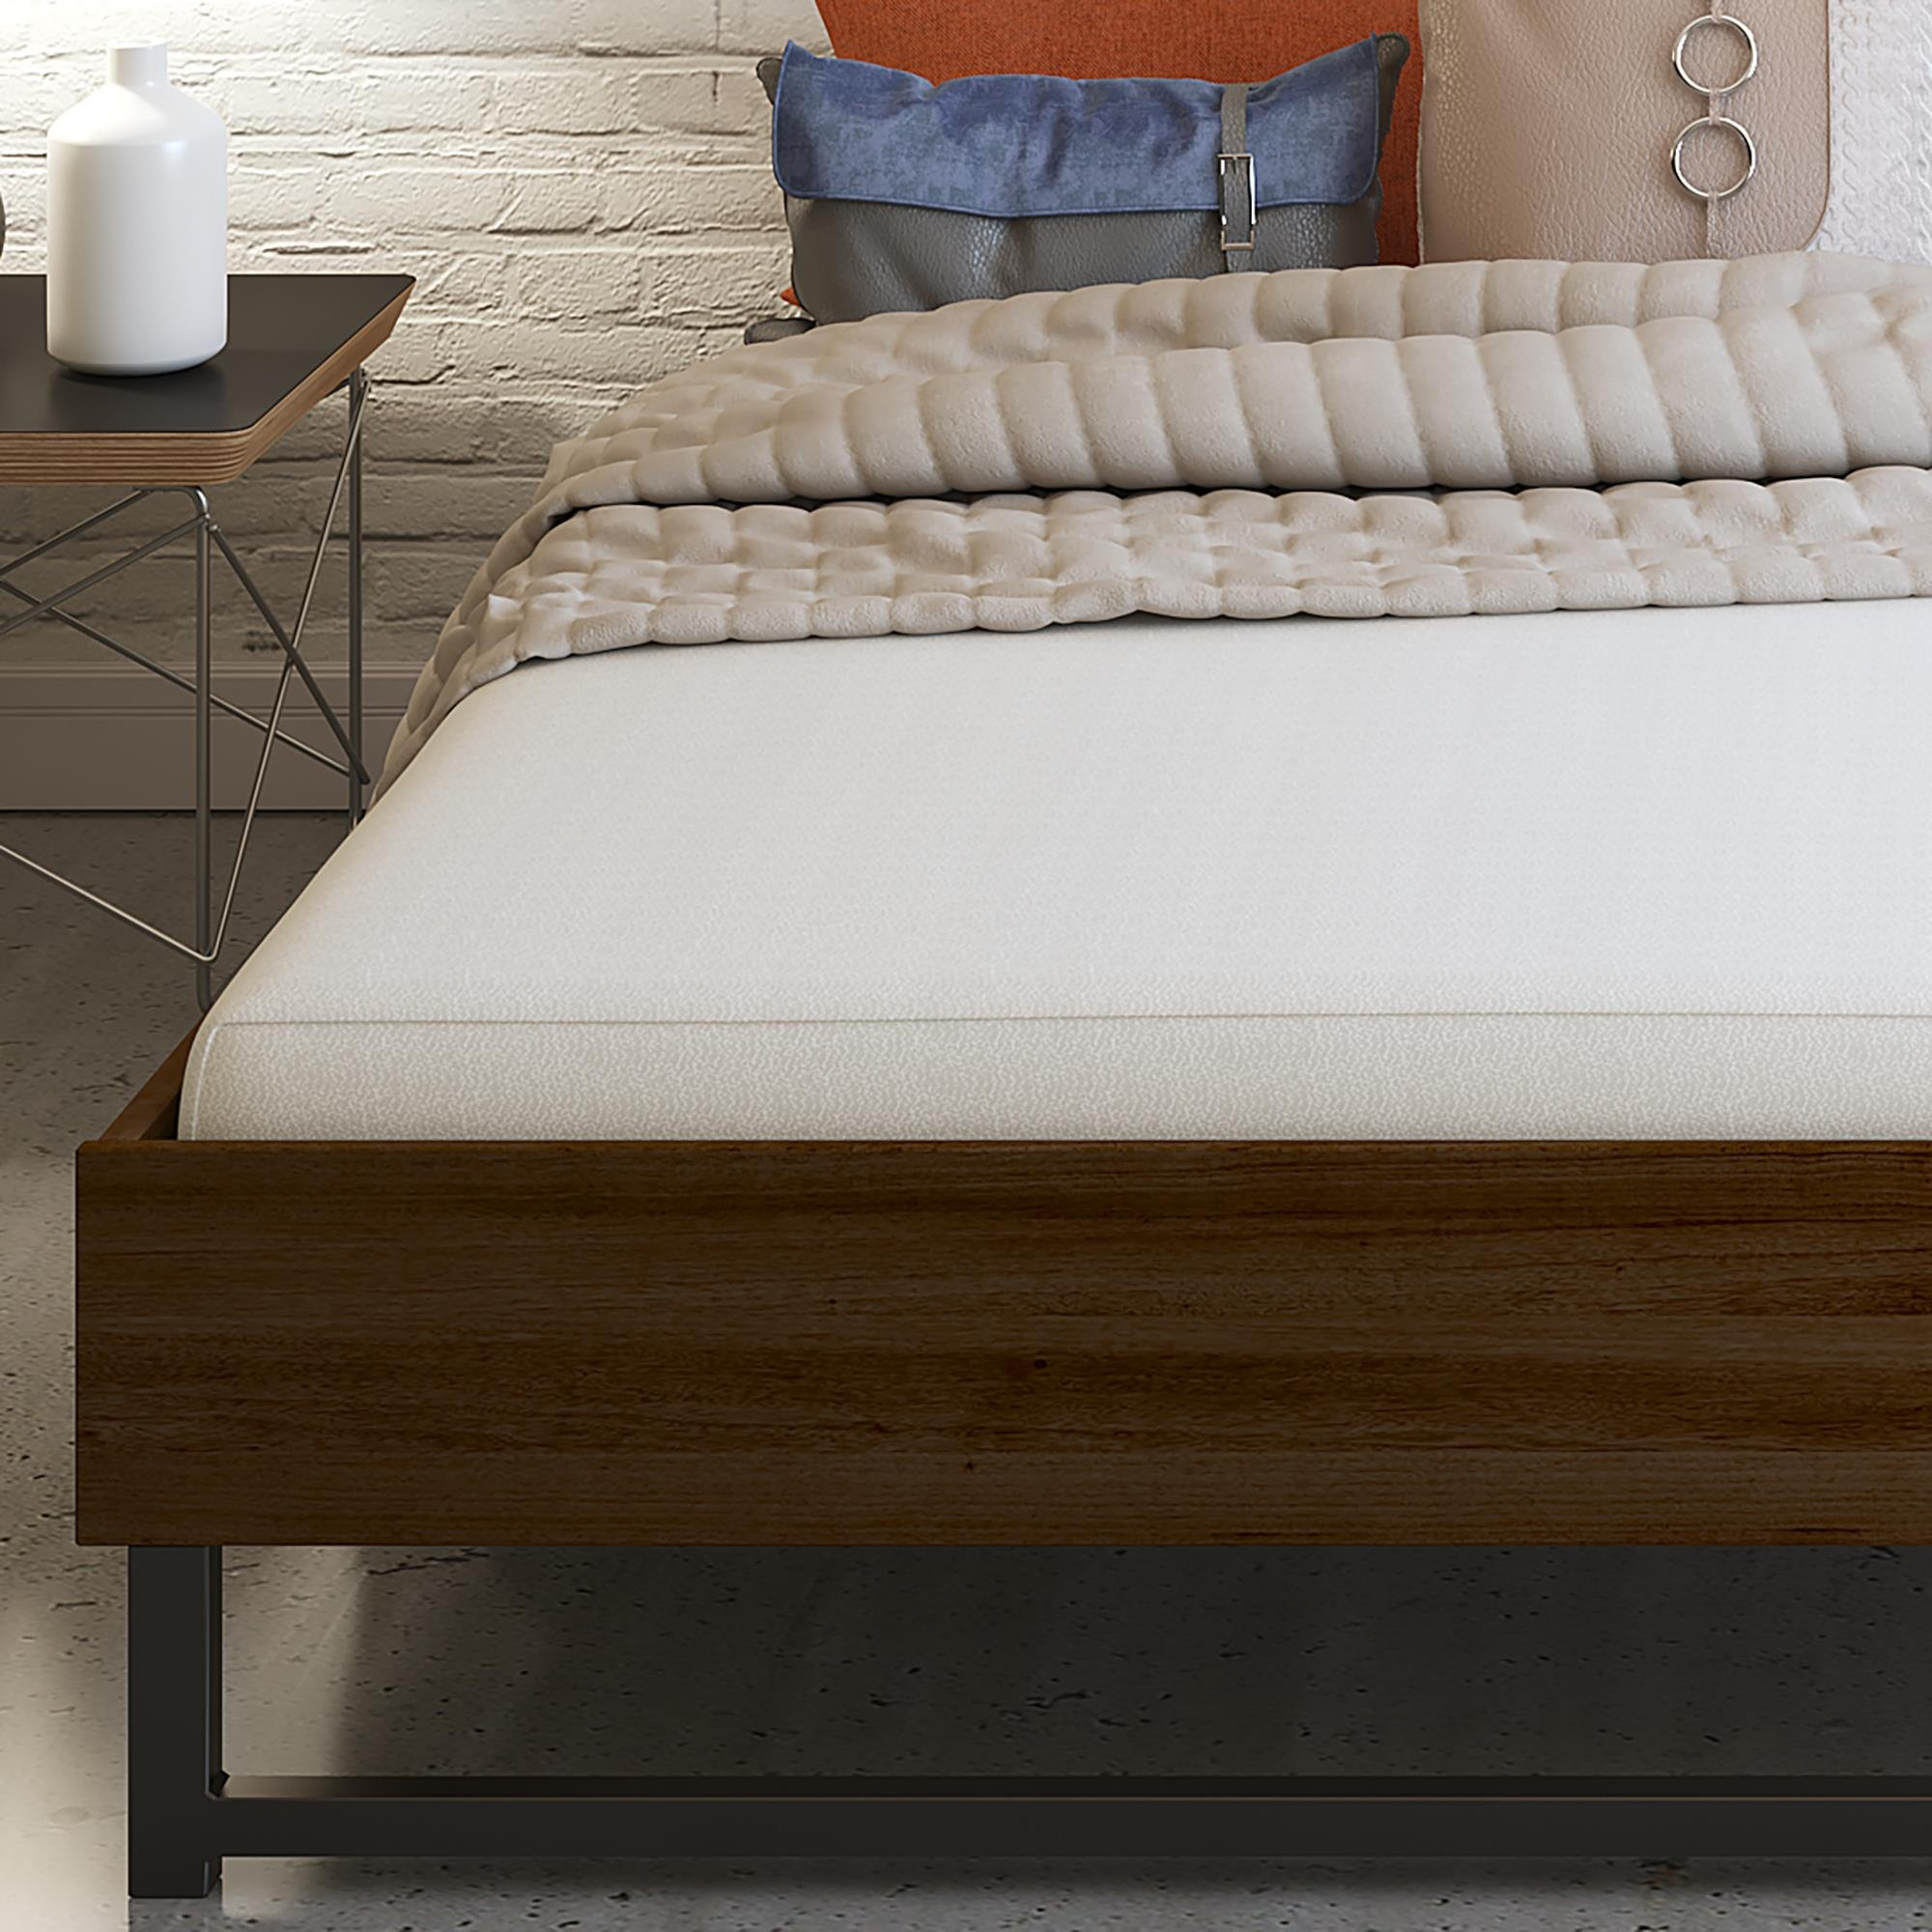 Signature Sleep Memoir 6-Inch Memory Foam Mattress, Twin XL Size by Signature Sleep